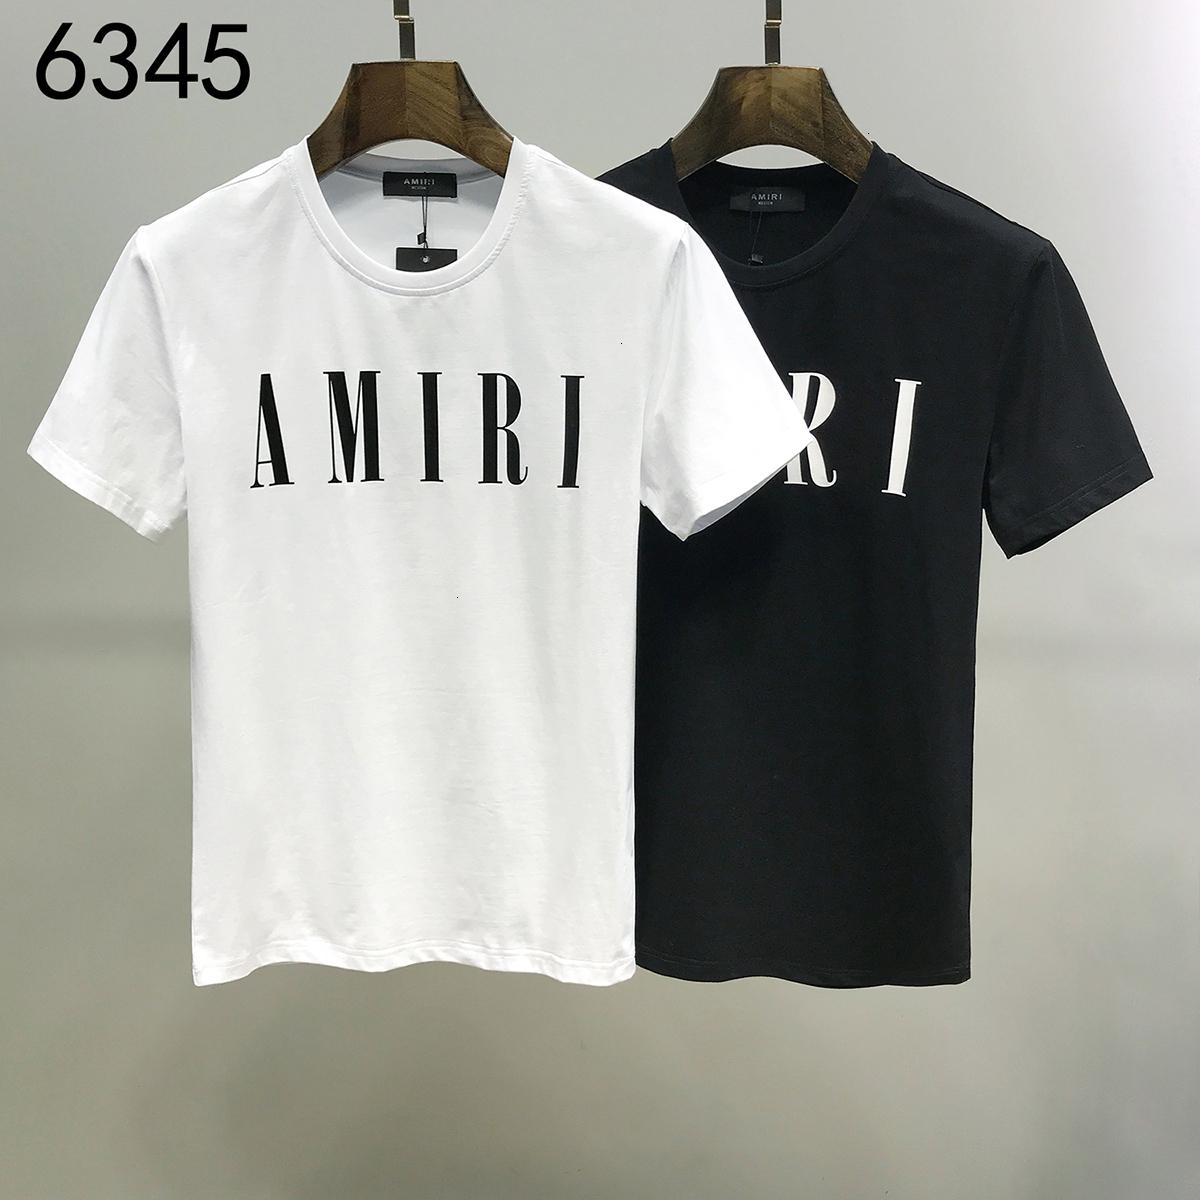 2020 spring summer mens t shirts top quality print short sleeve T-shirt 20191116-da4390#02163*63_6345